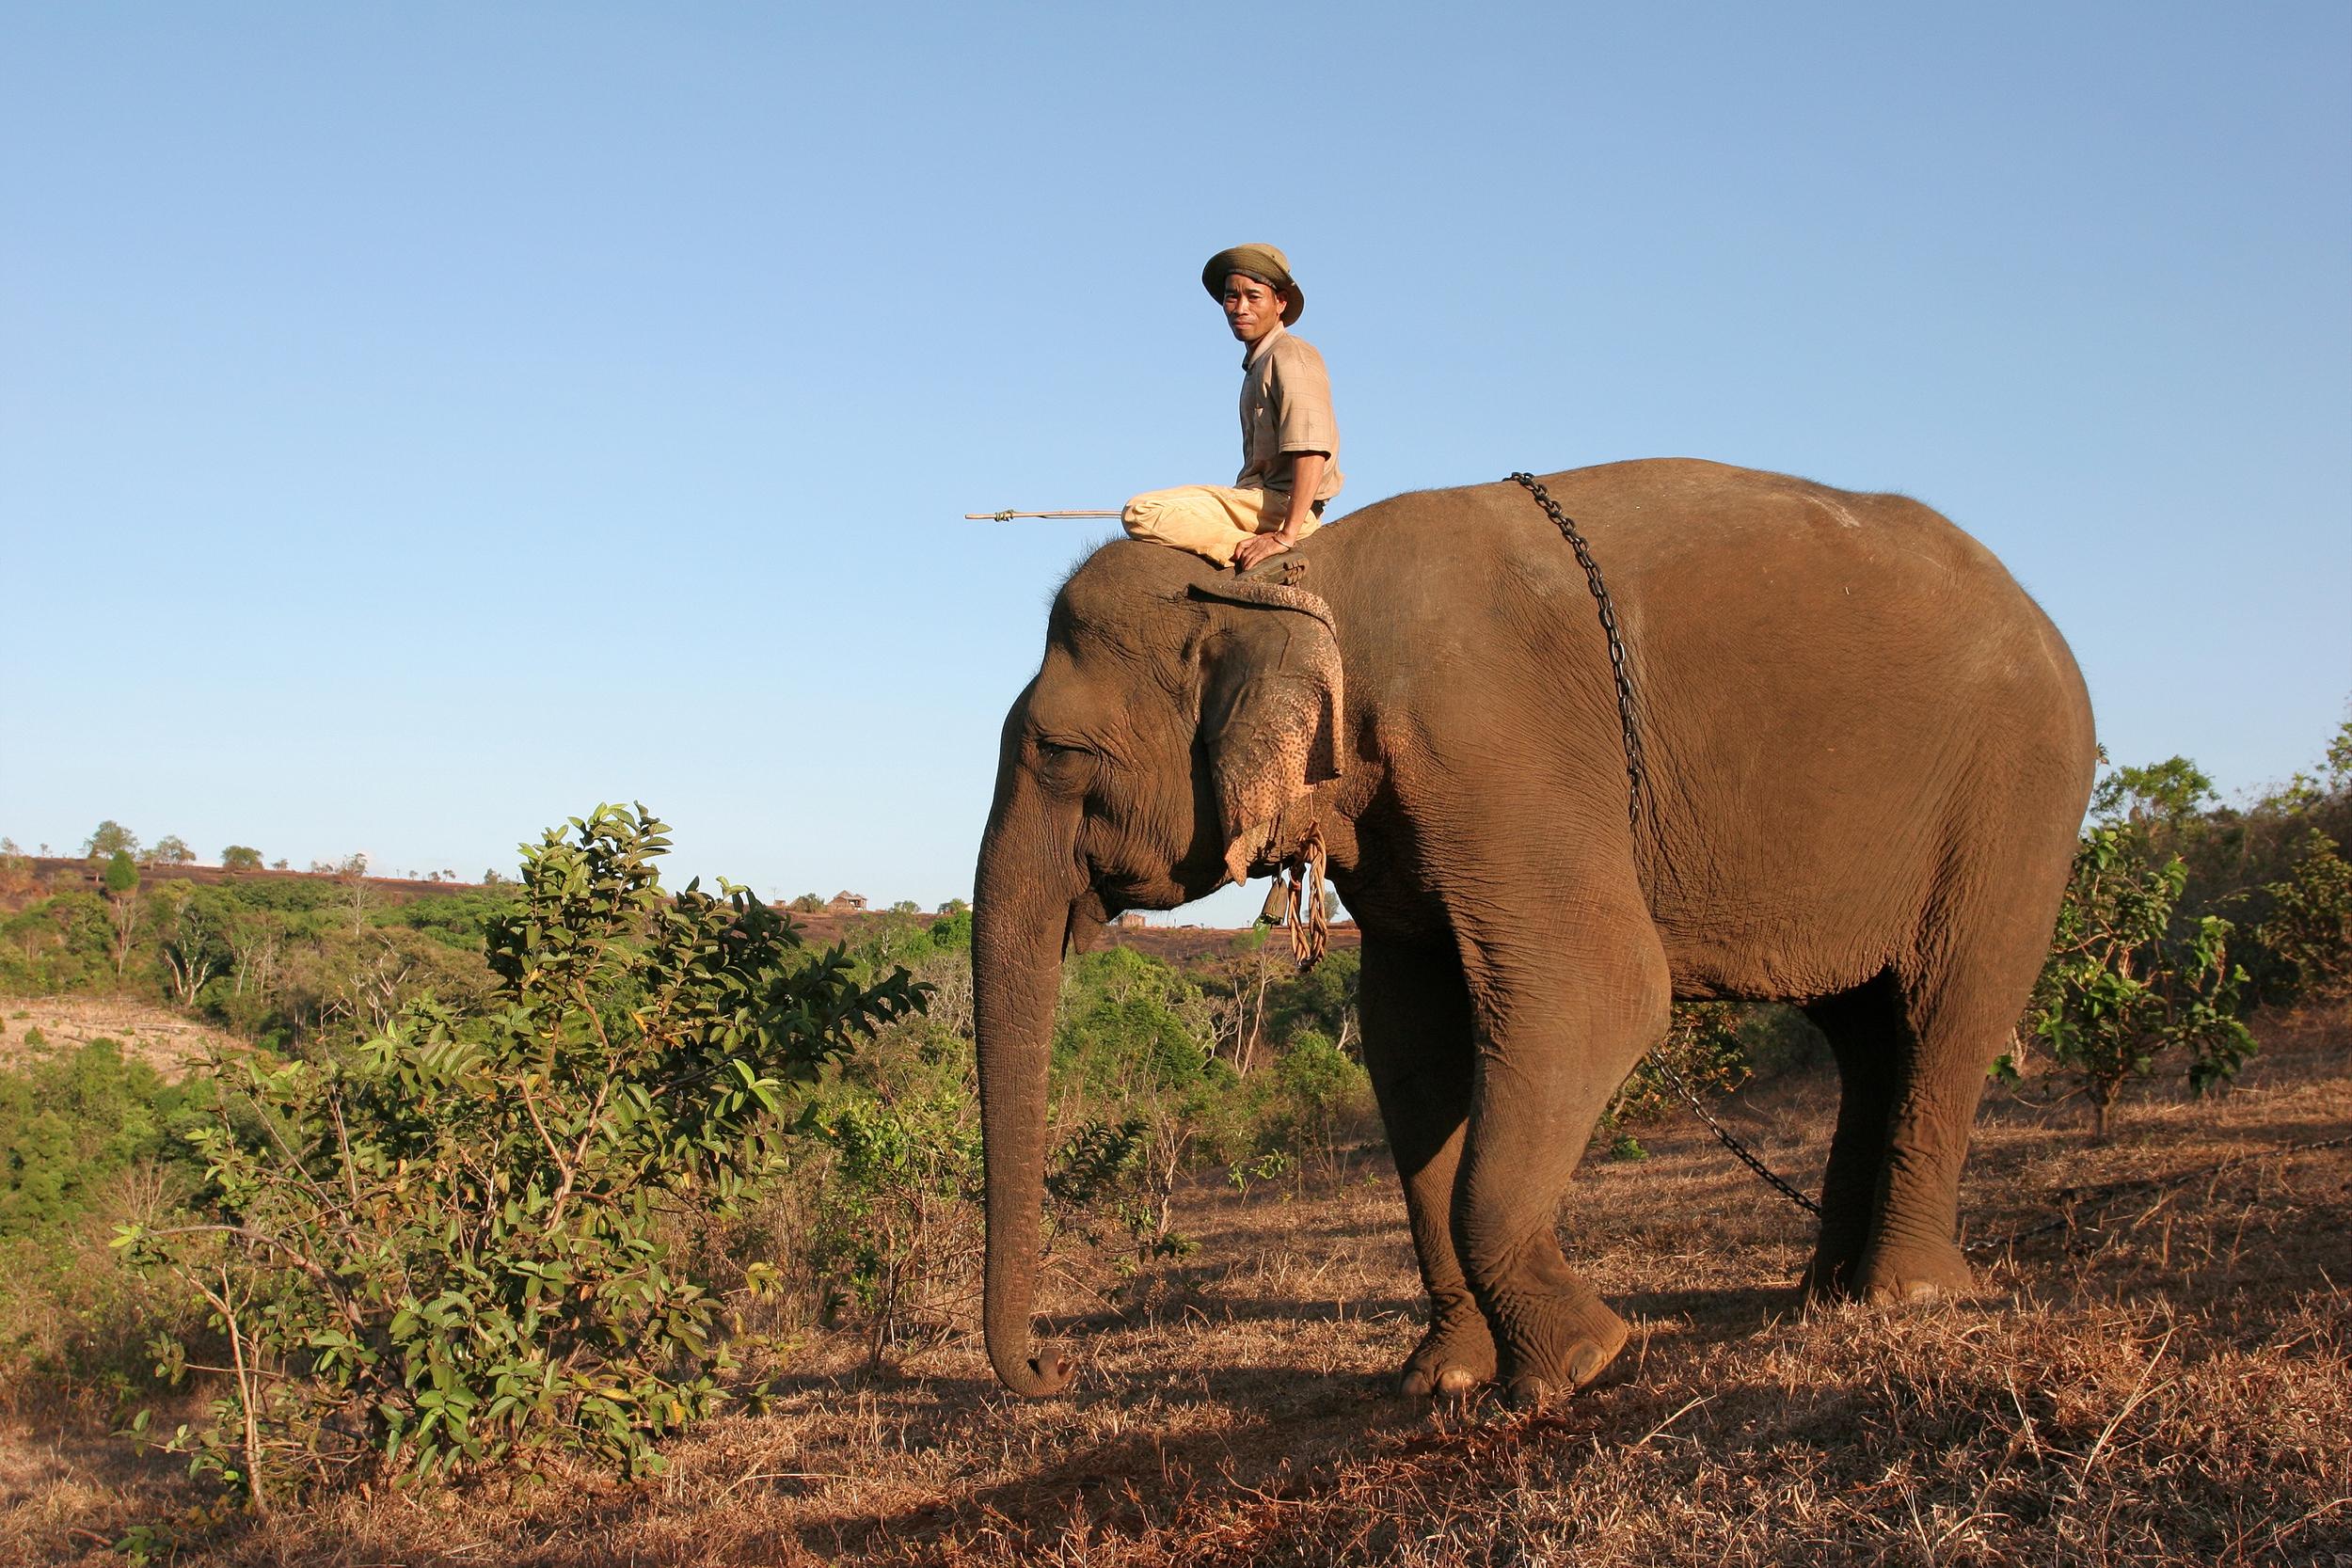 LDHE - mahoutelephant - photoAroonThaewchatturat.jpg